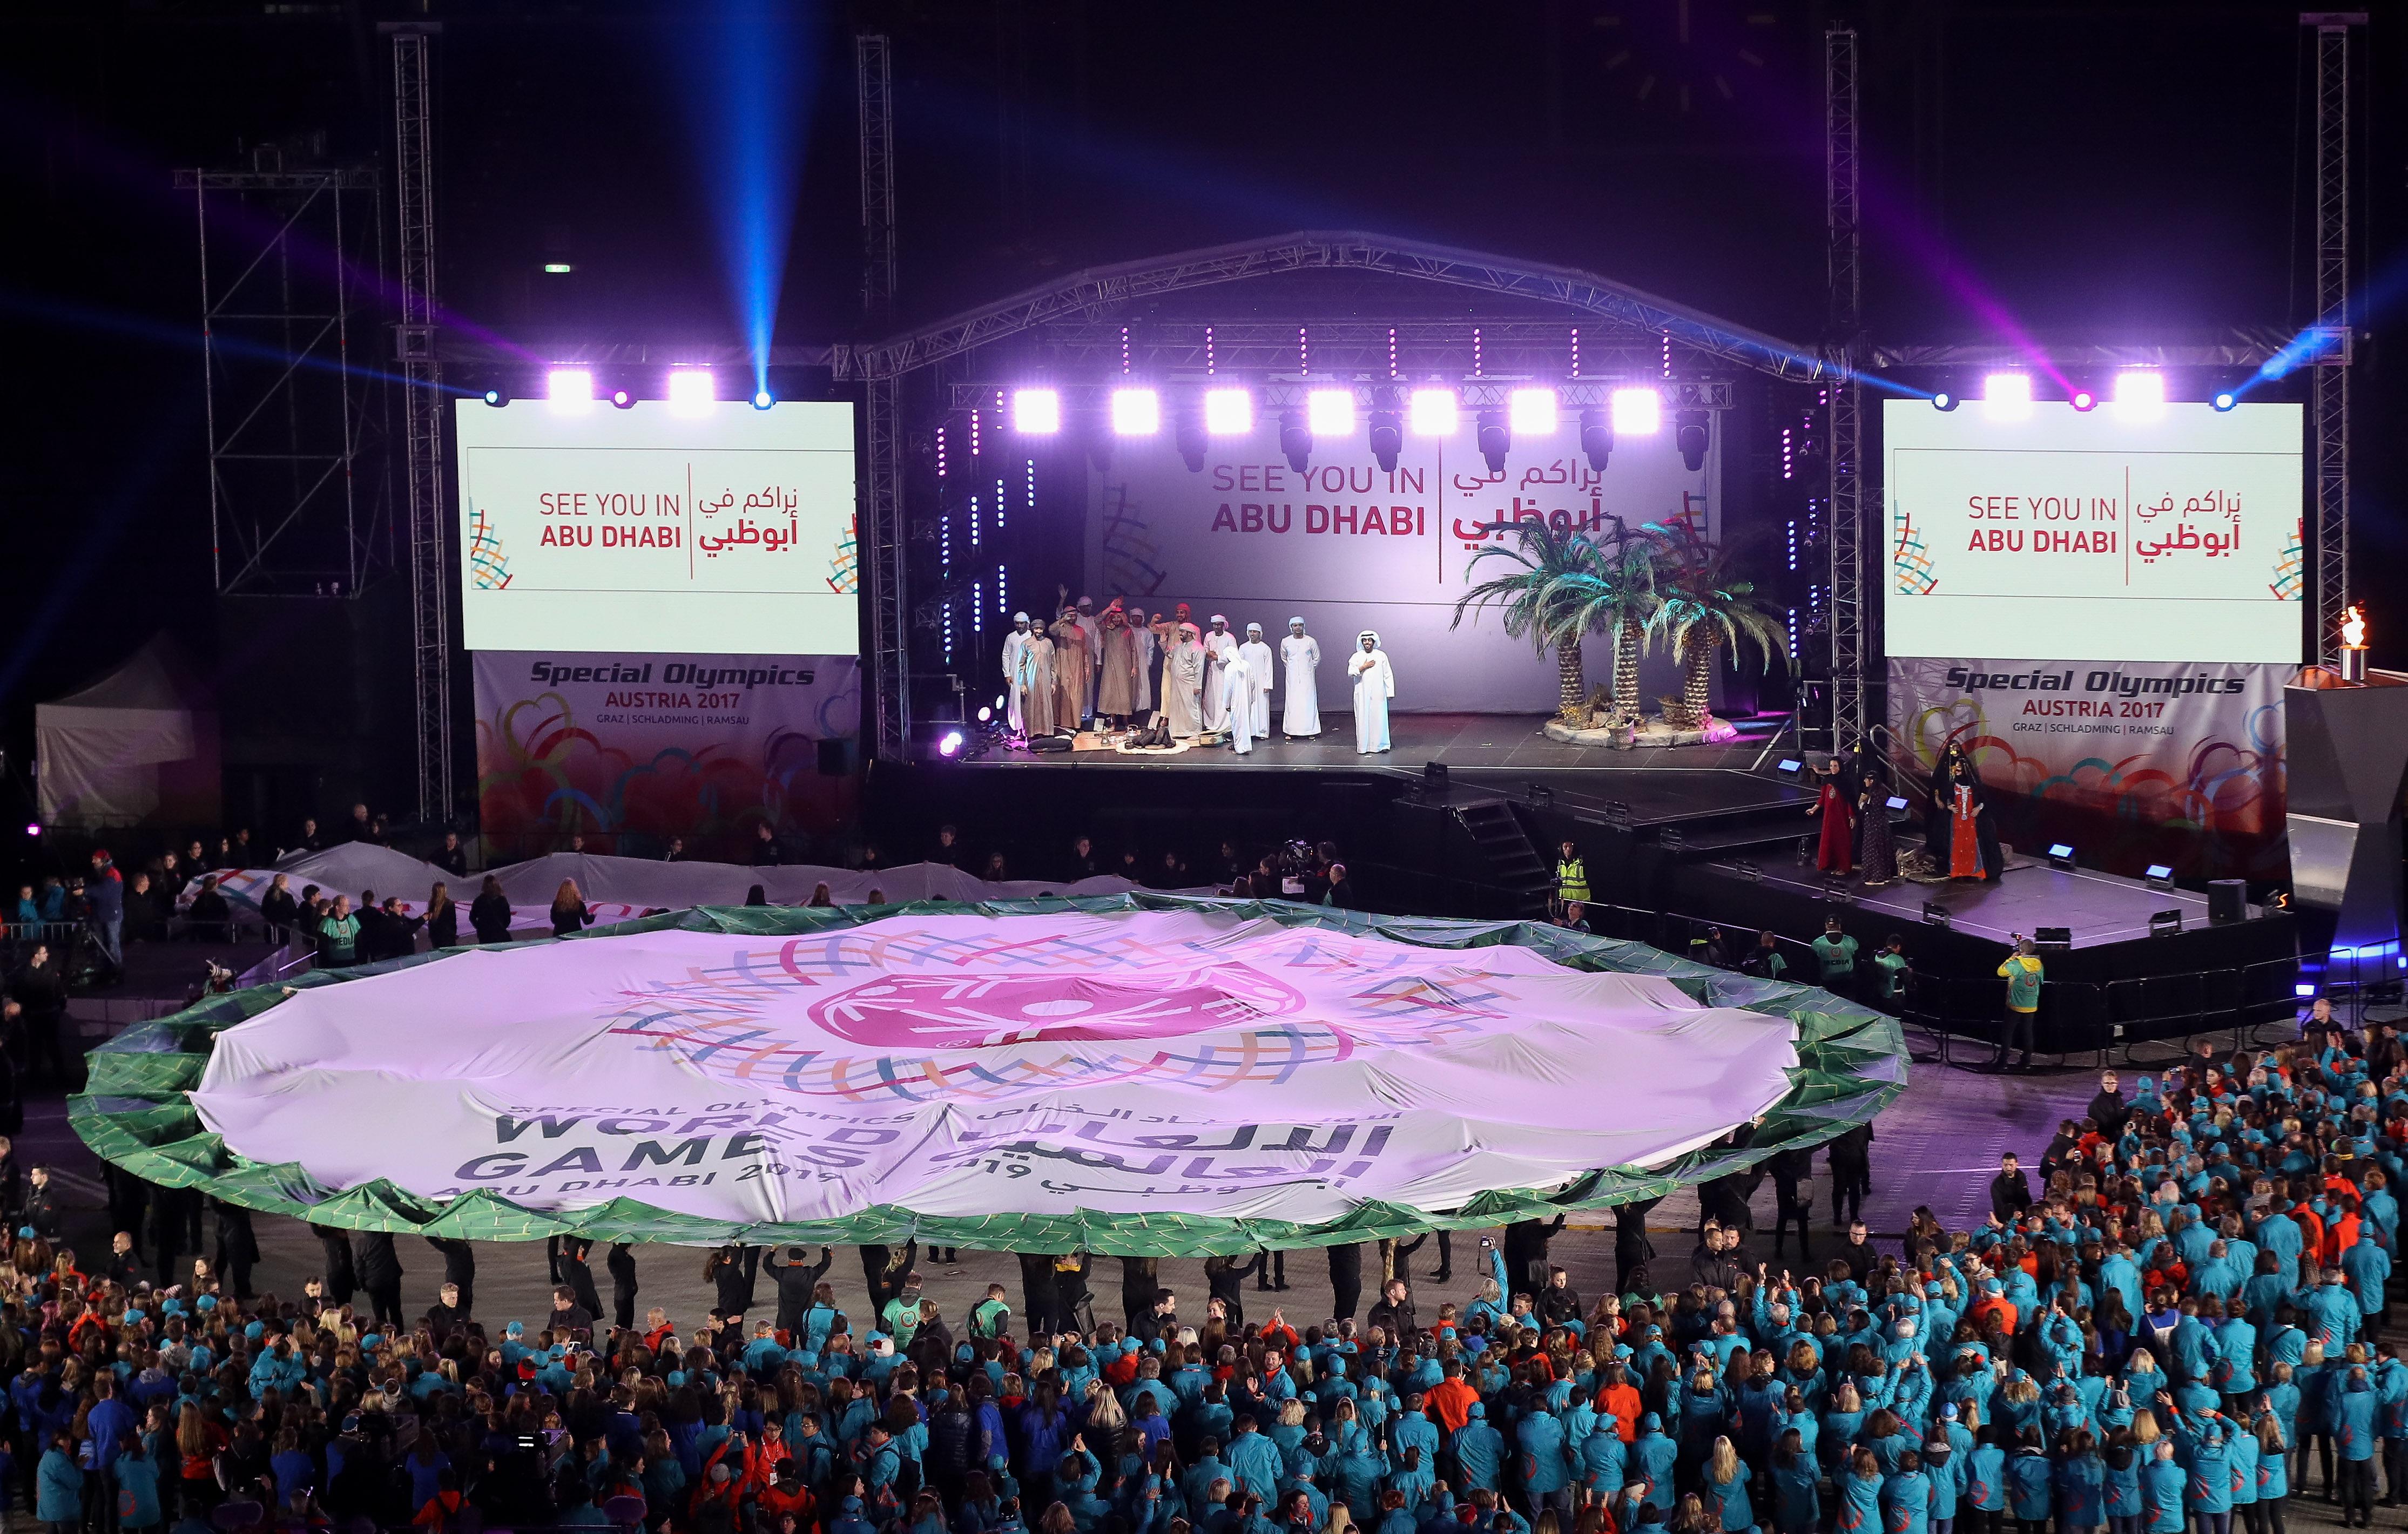 Austria 2017 Closing Ceremony